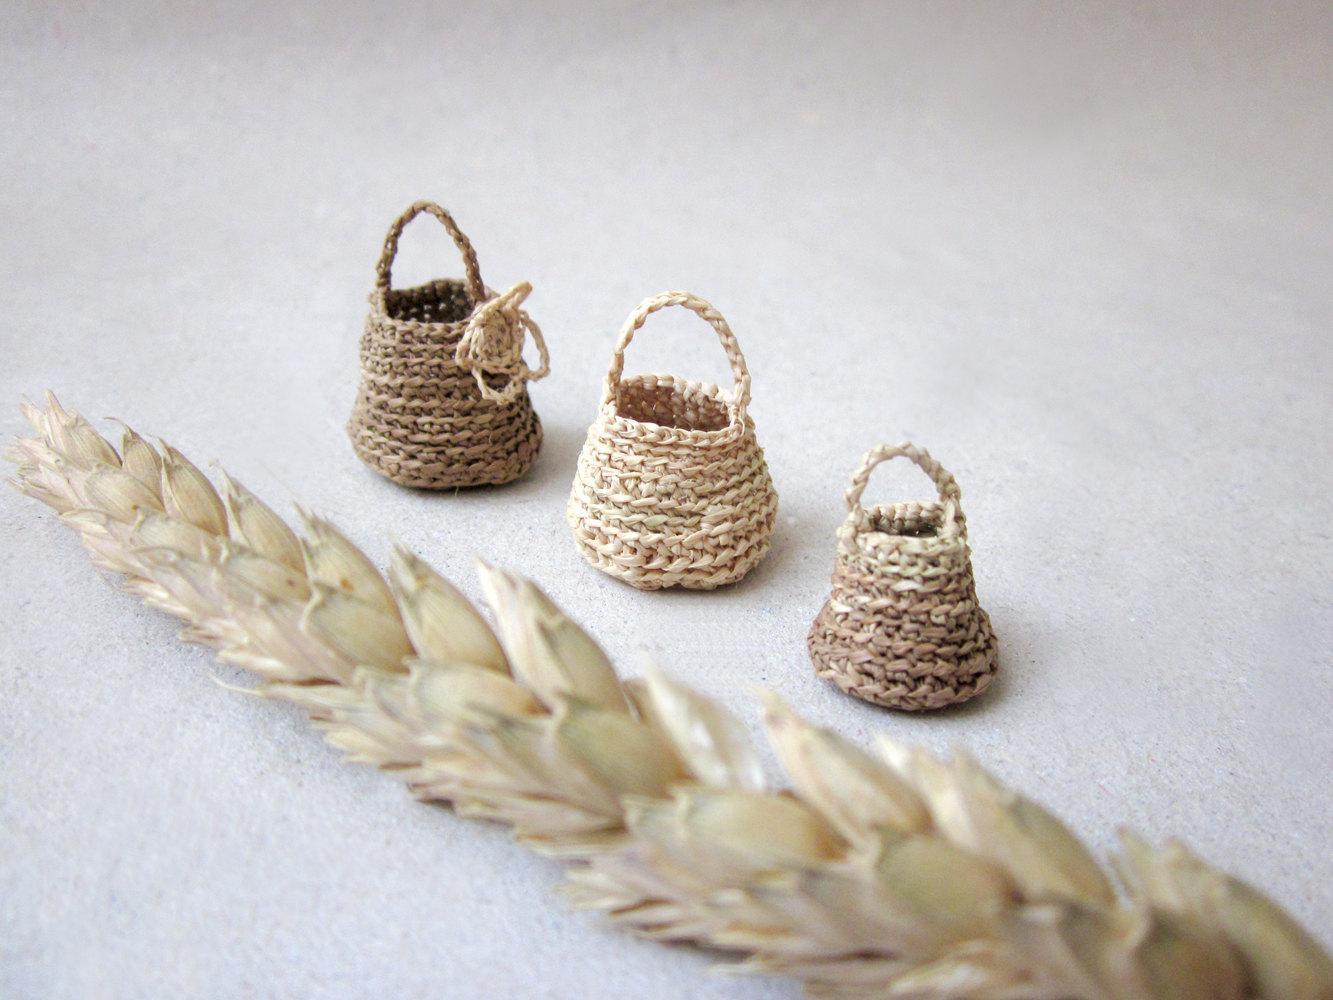 Miniature elf's baskets set of three kitchen decor by plad on Etsy